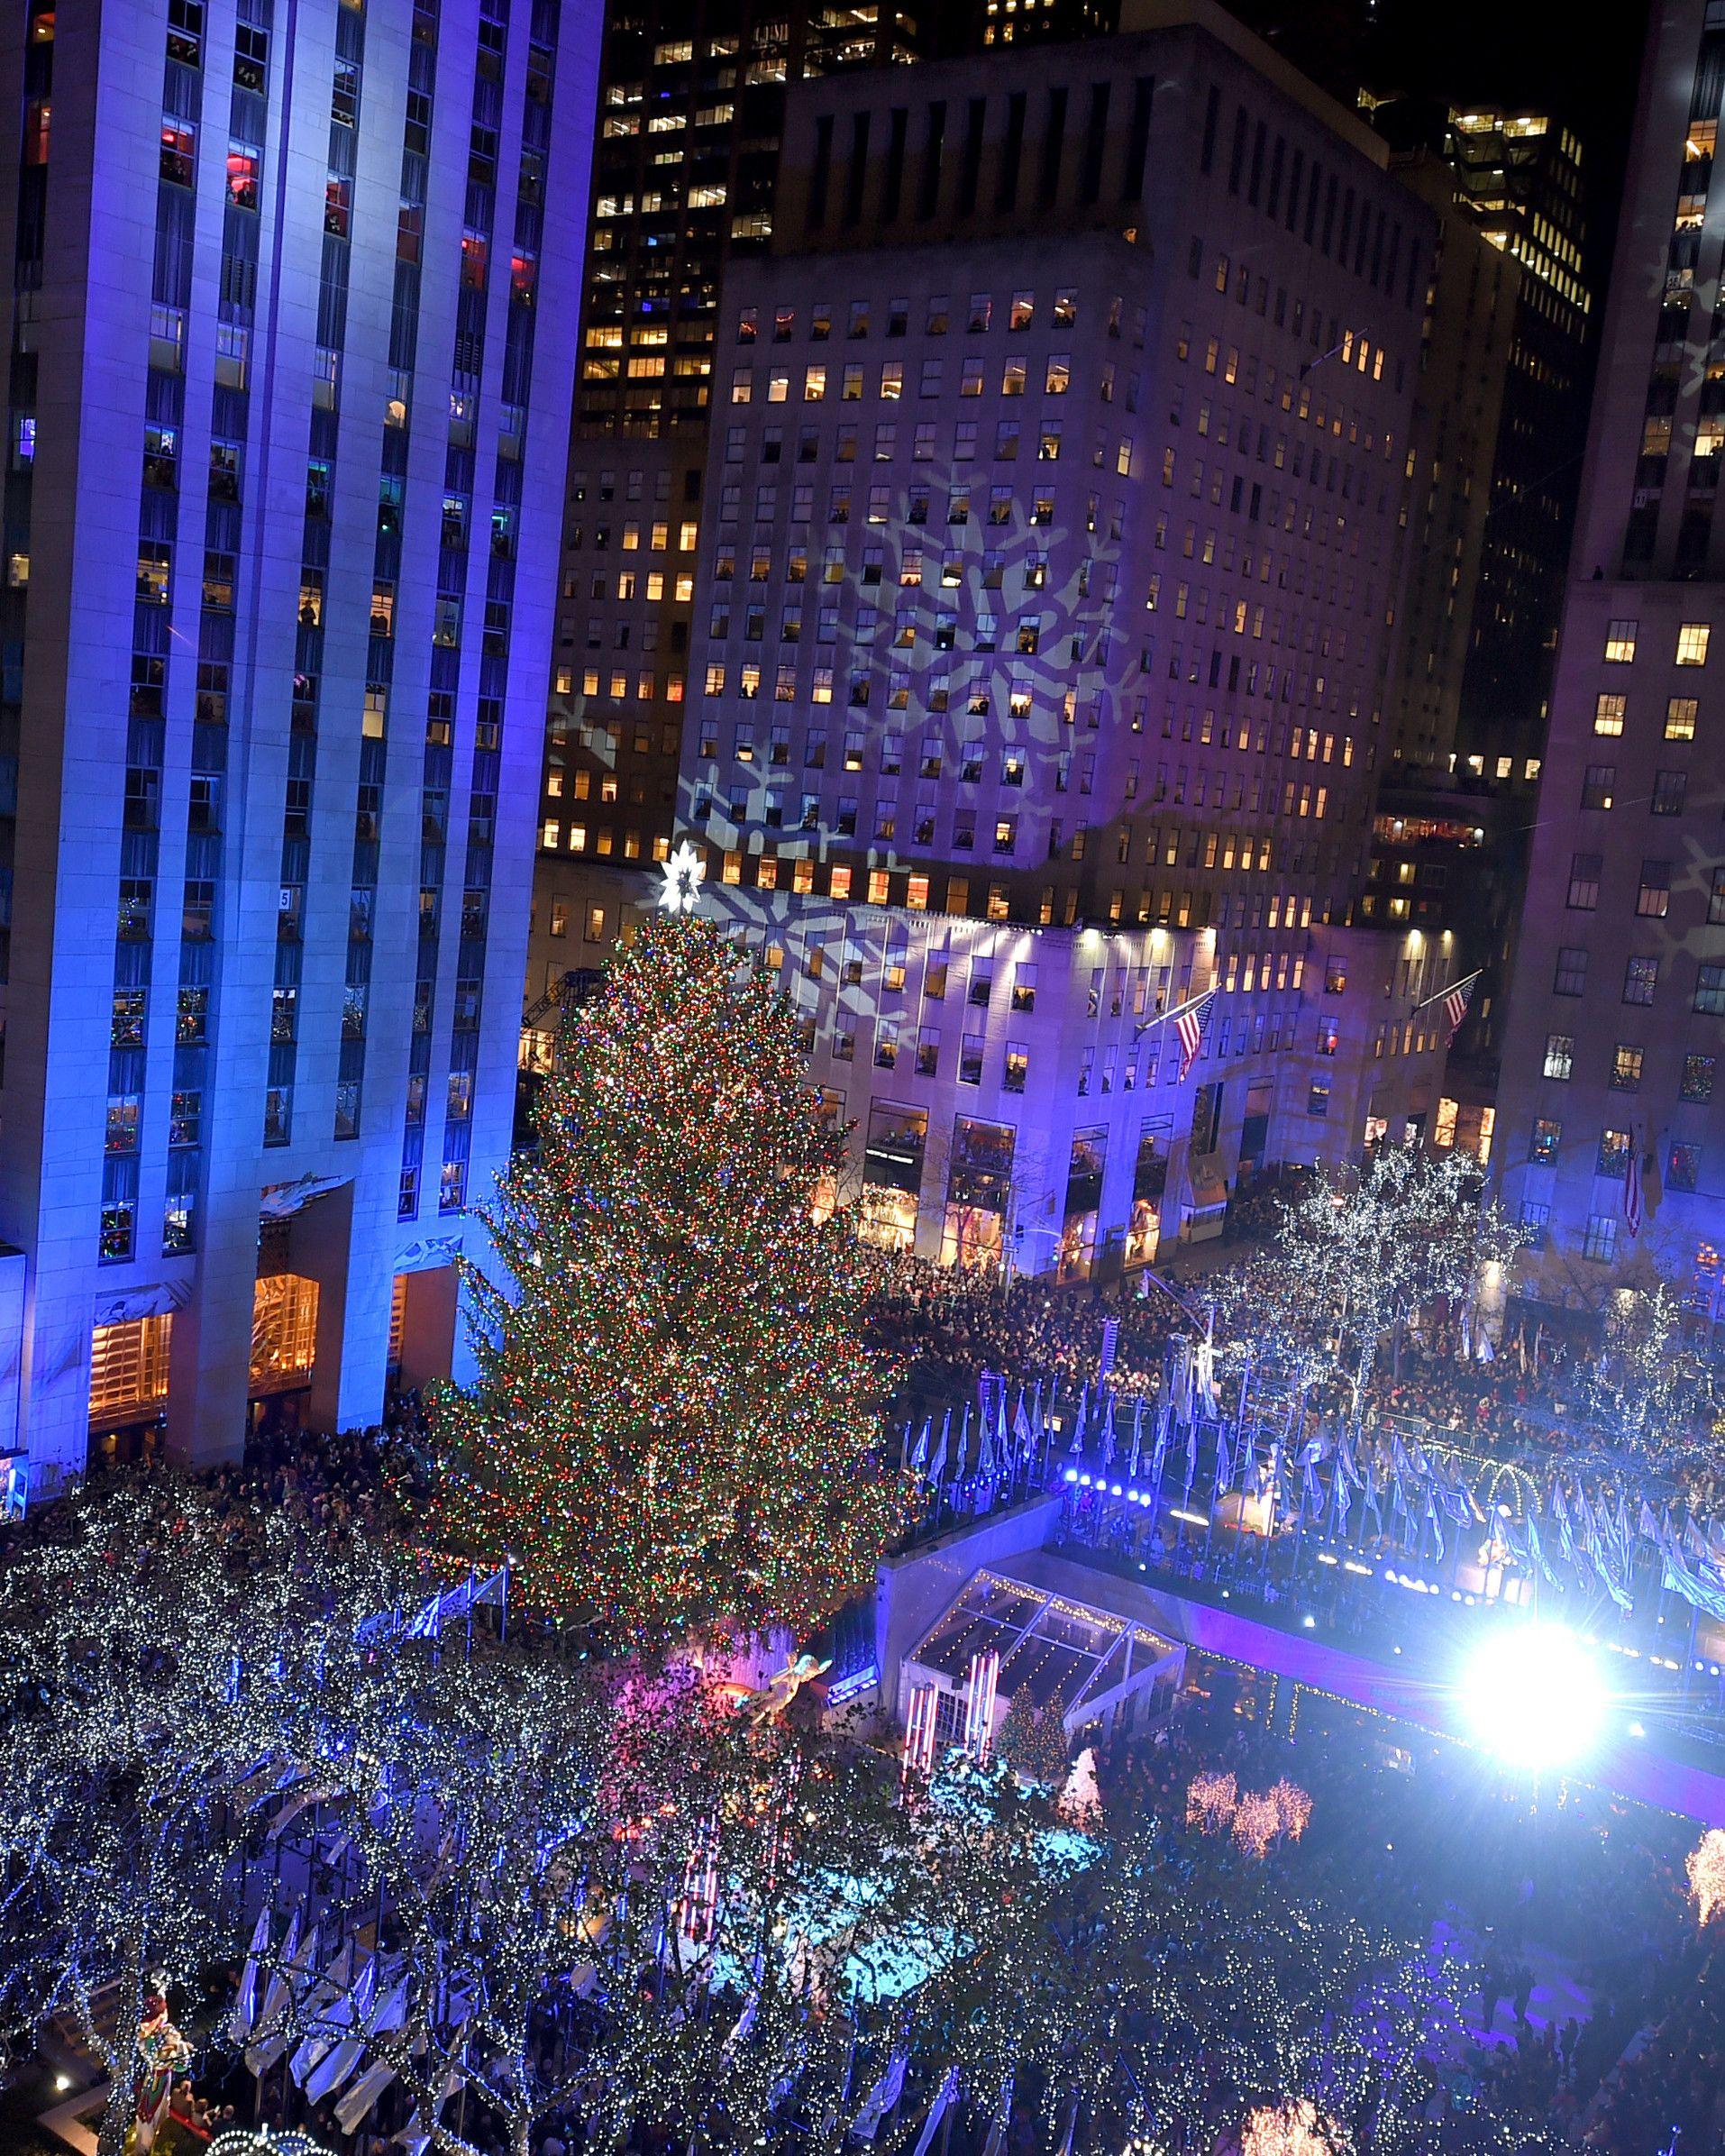 Rockefeller Center Christmas Tree Lighting Performers: 5 Facts About The Rockefeller Center Christmas Tree 2017